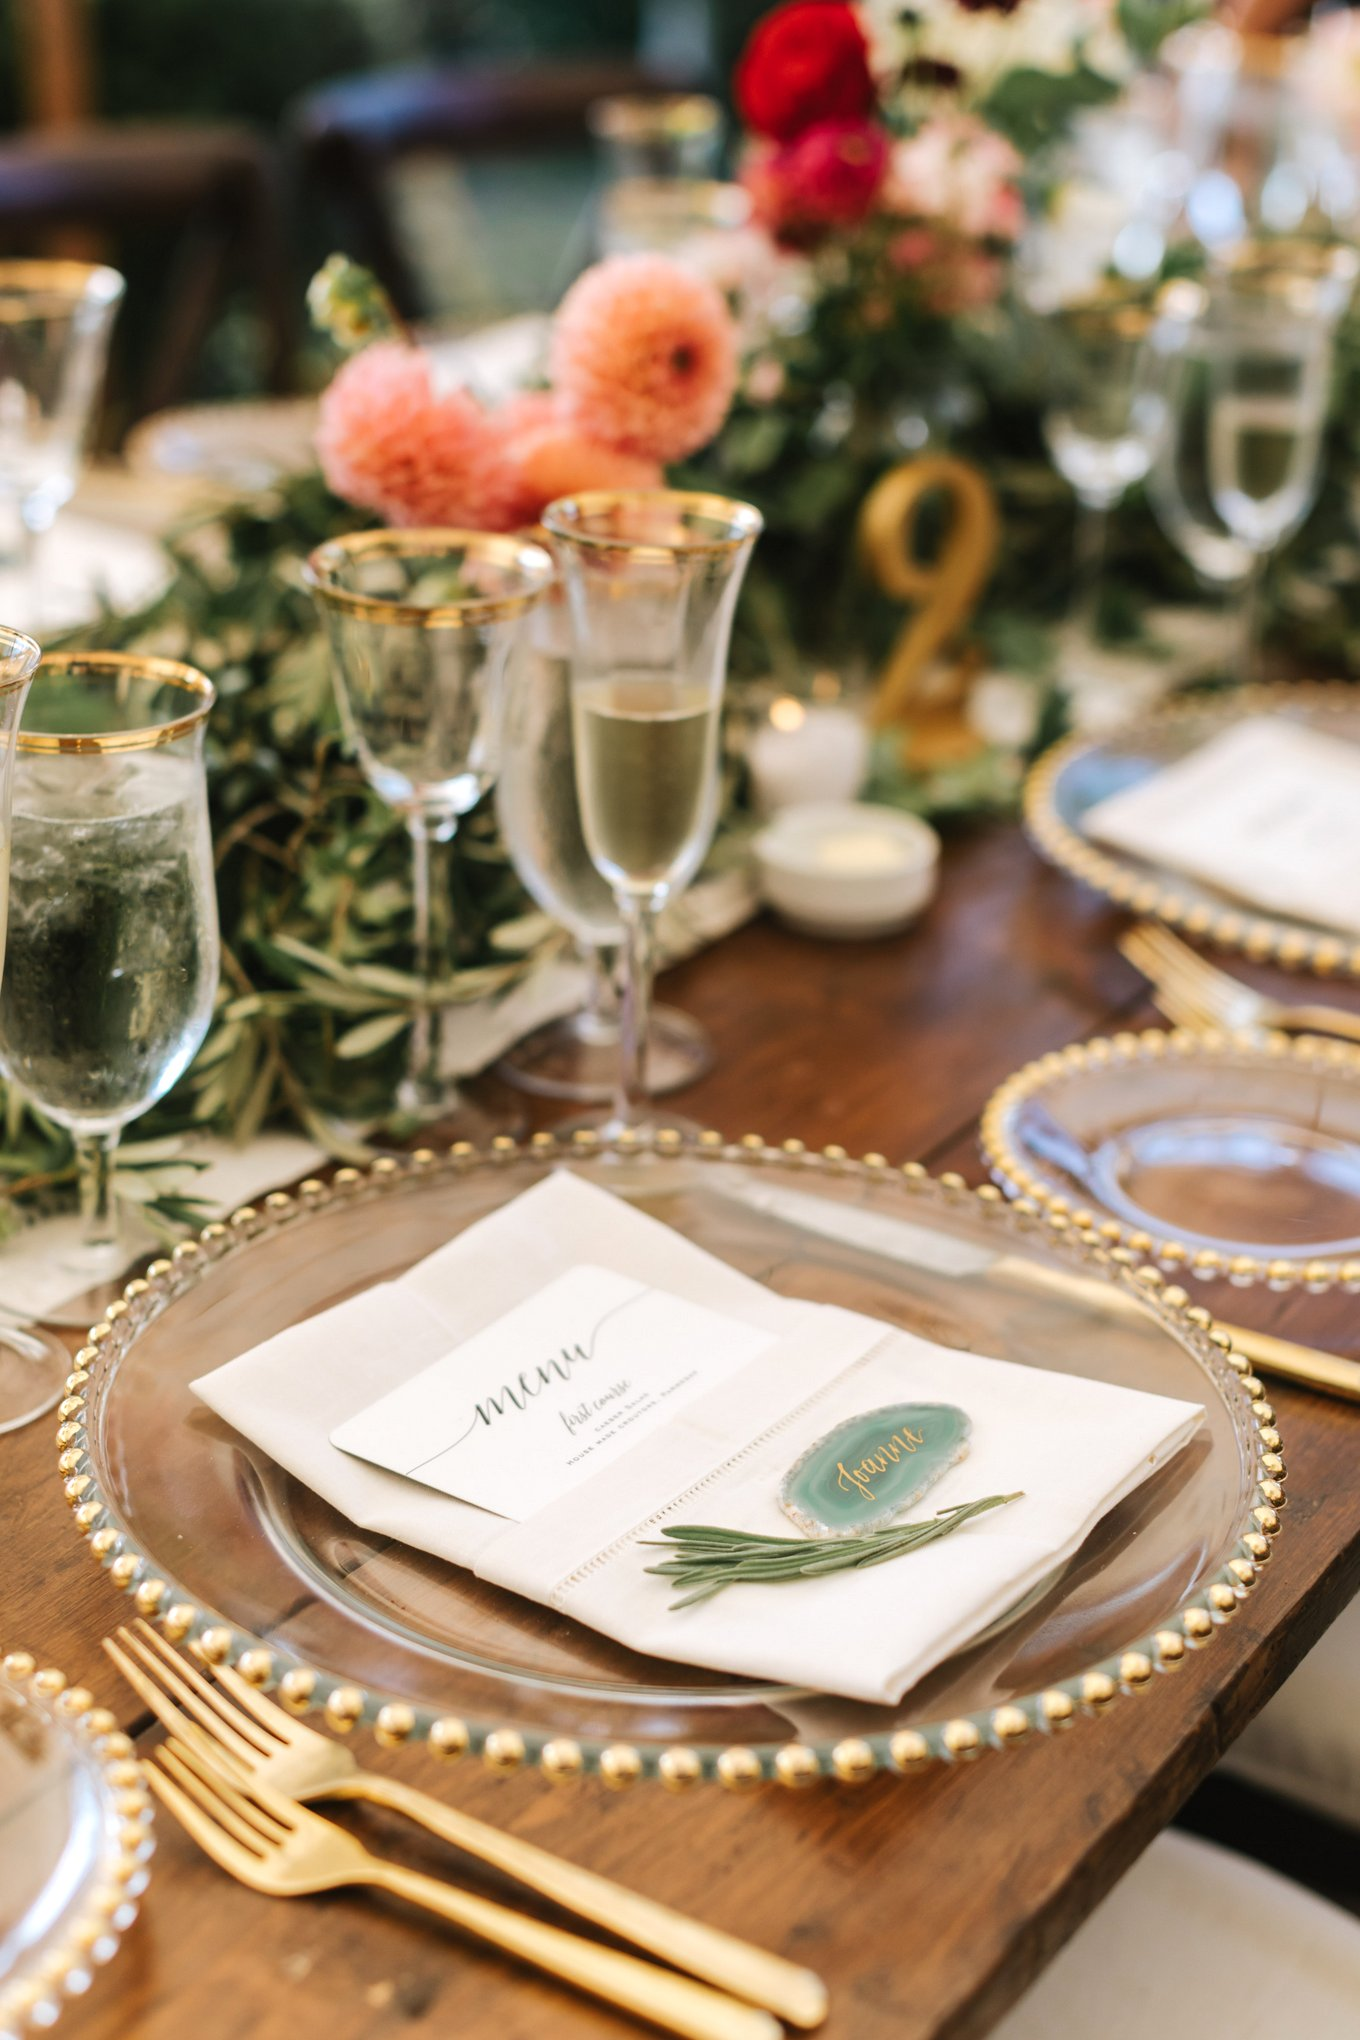 Marthas-Vineyard-Wedding-Photographer-Beach-Plum-Inn-29.jpg